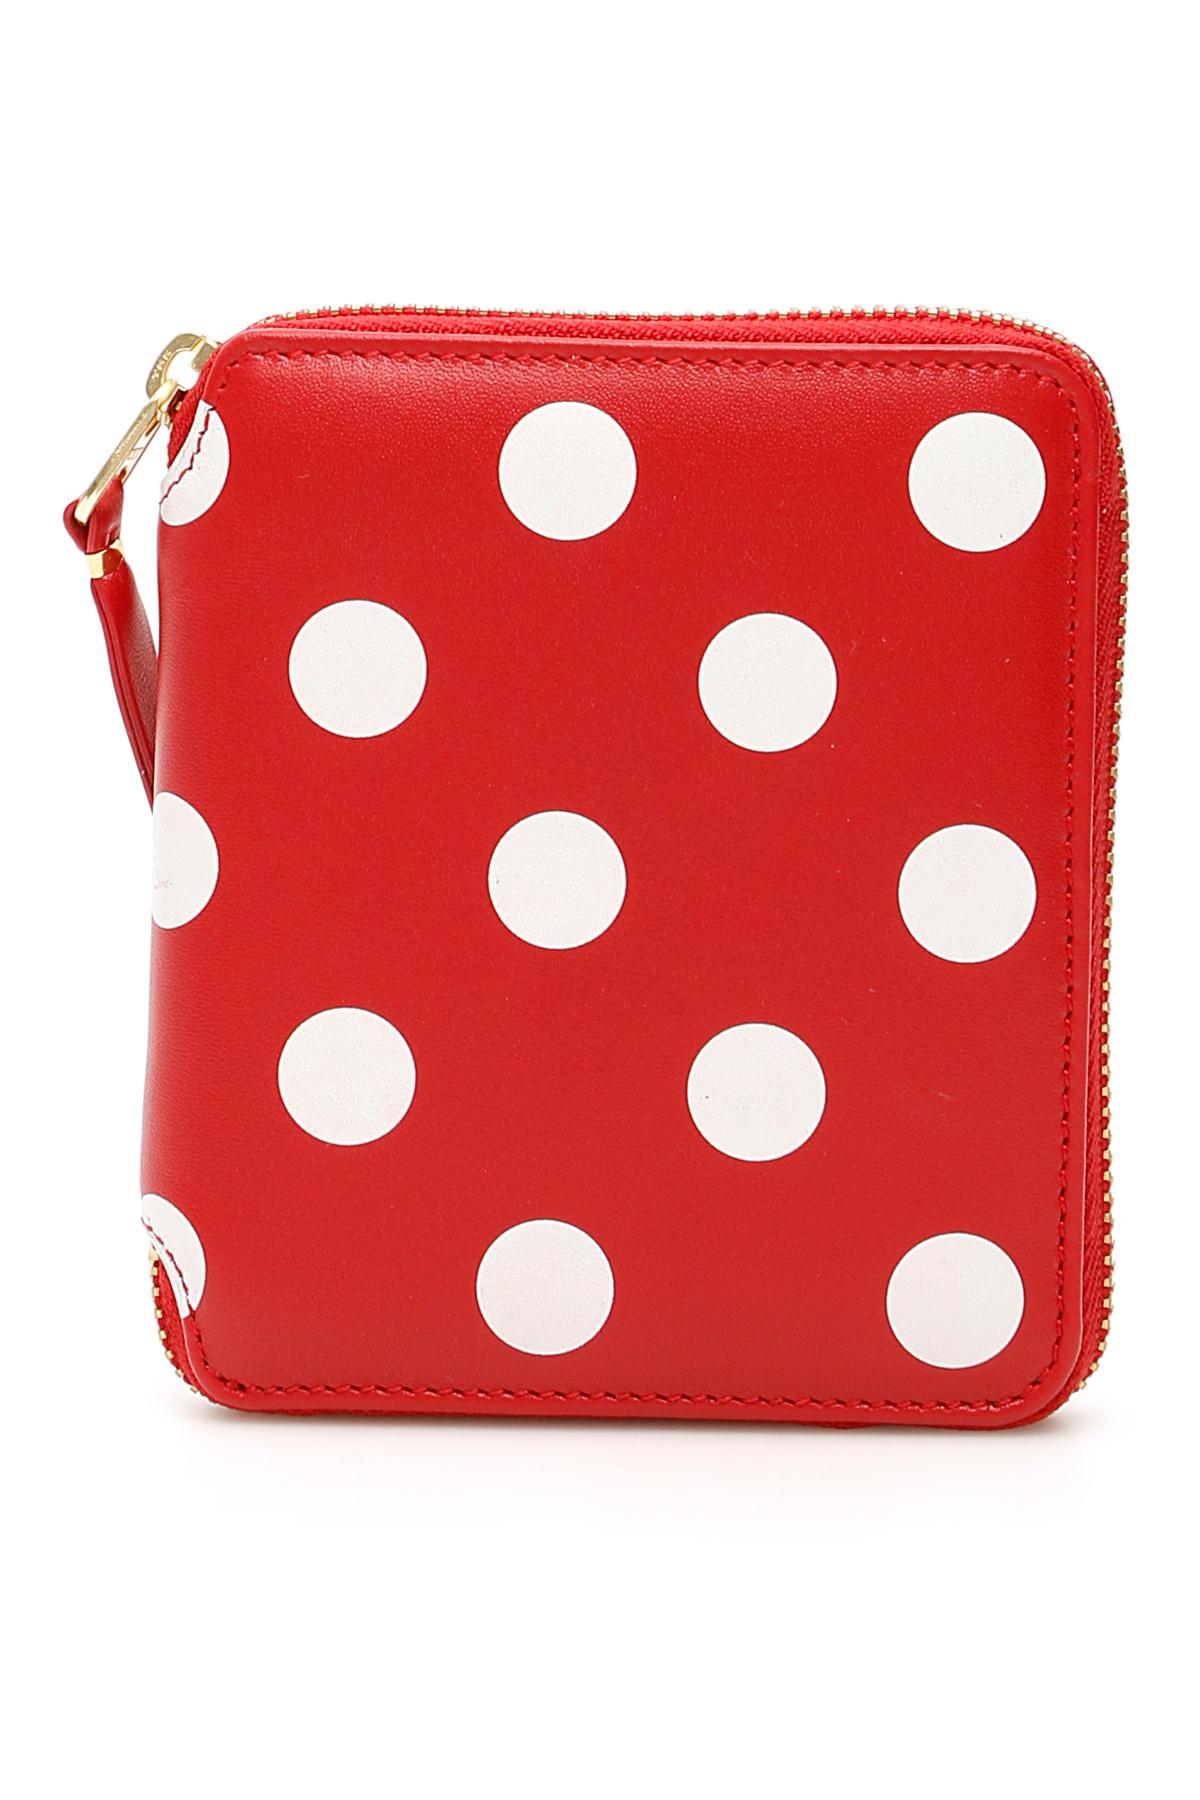 Comme des garcons wallet portafoglio zip around polka dots